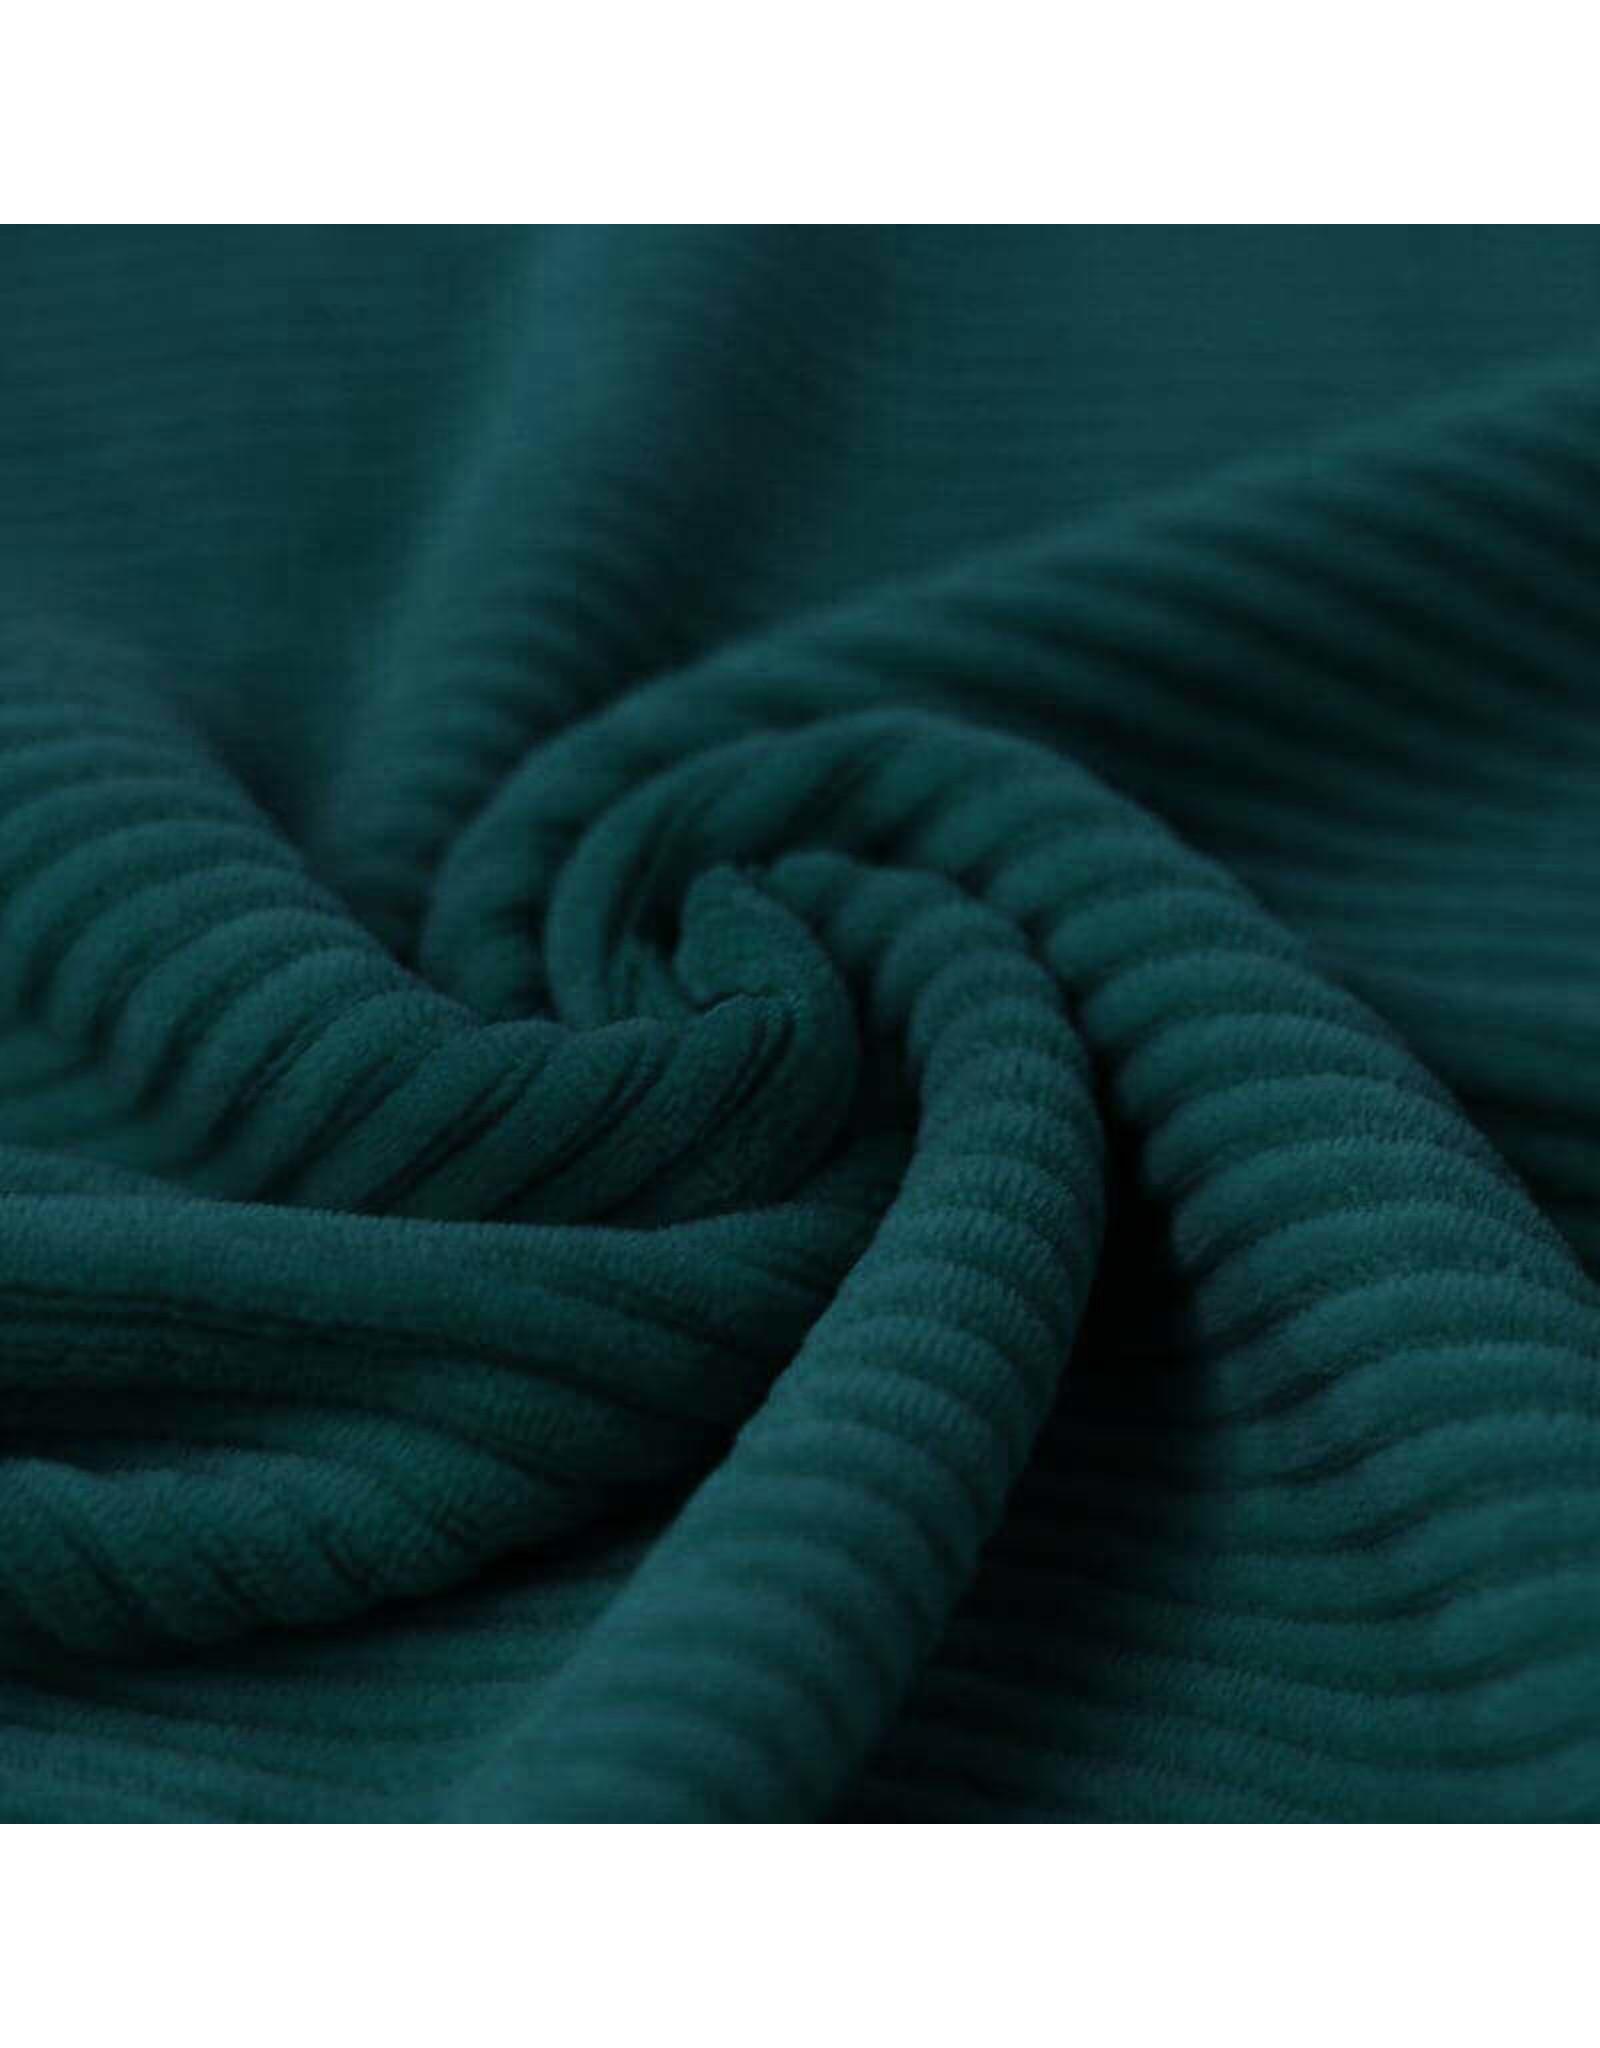 Stik-Stof Brede rib jersey dark green